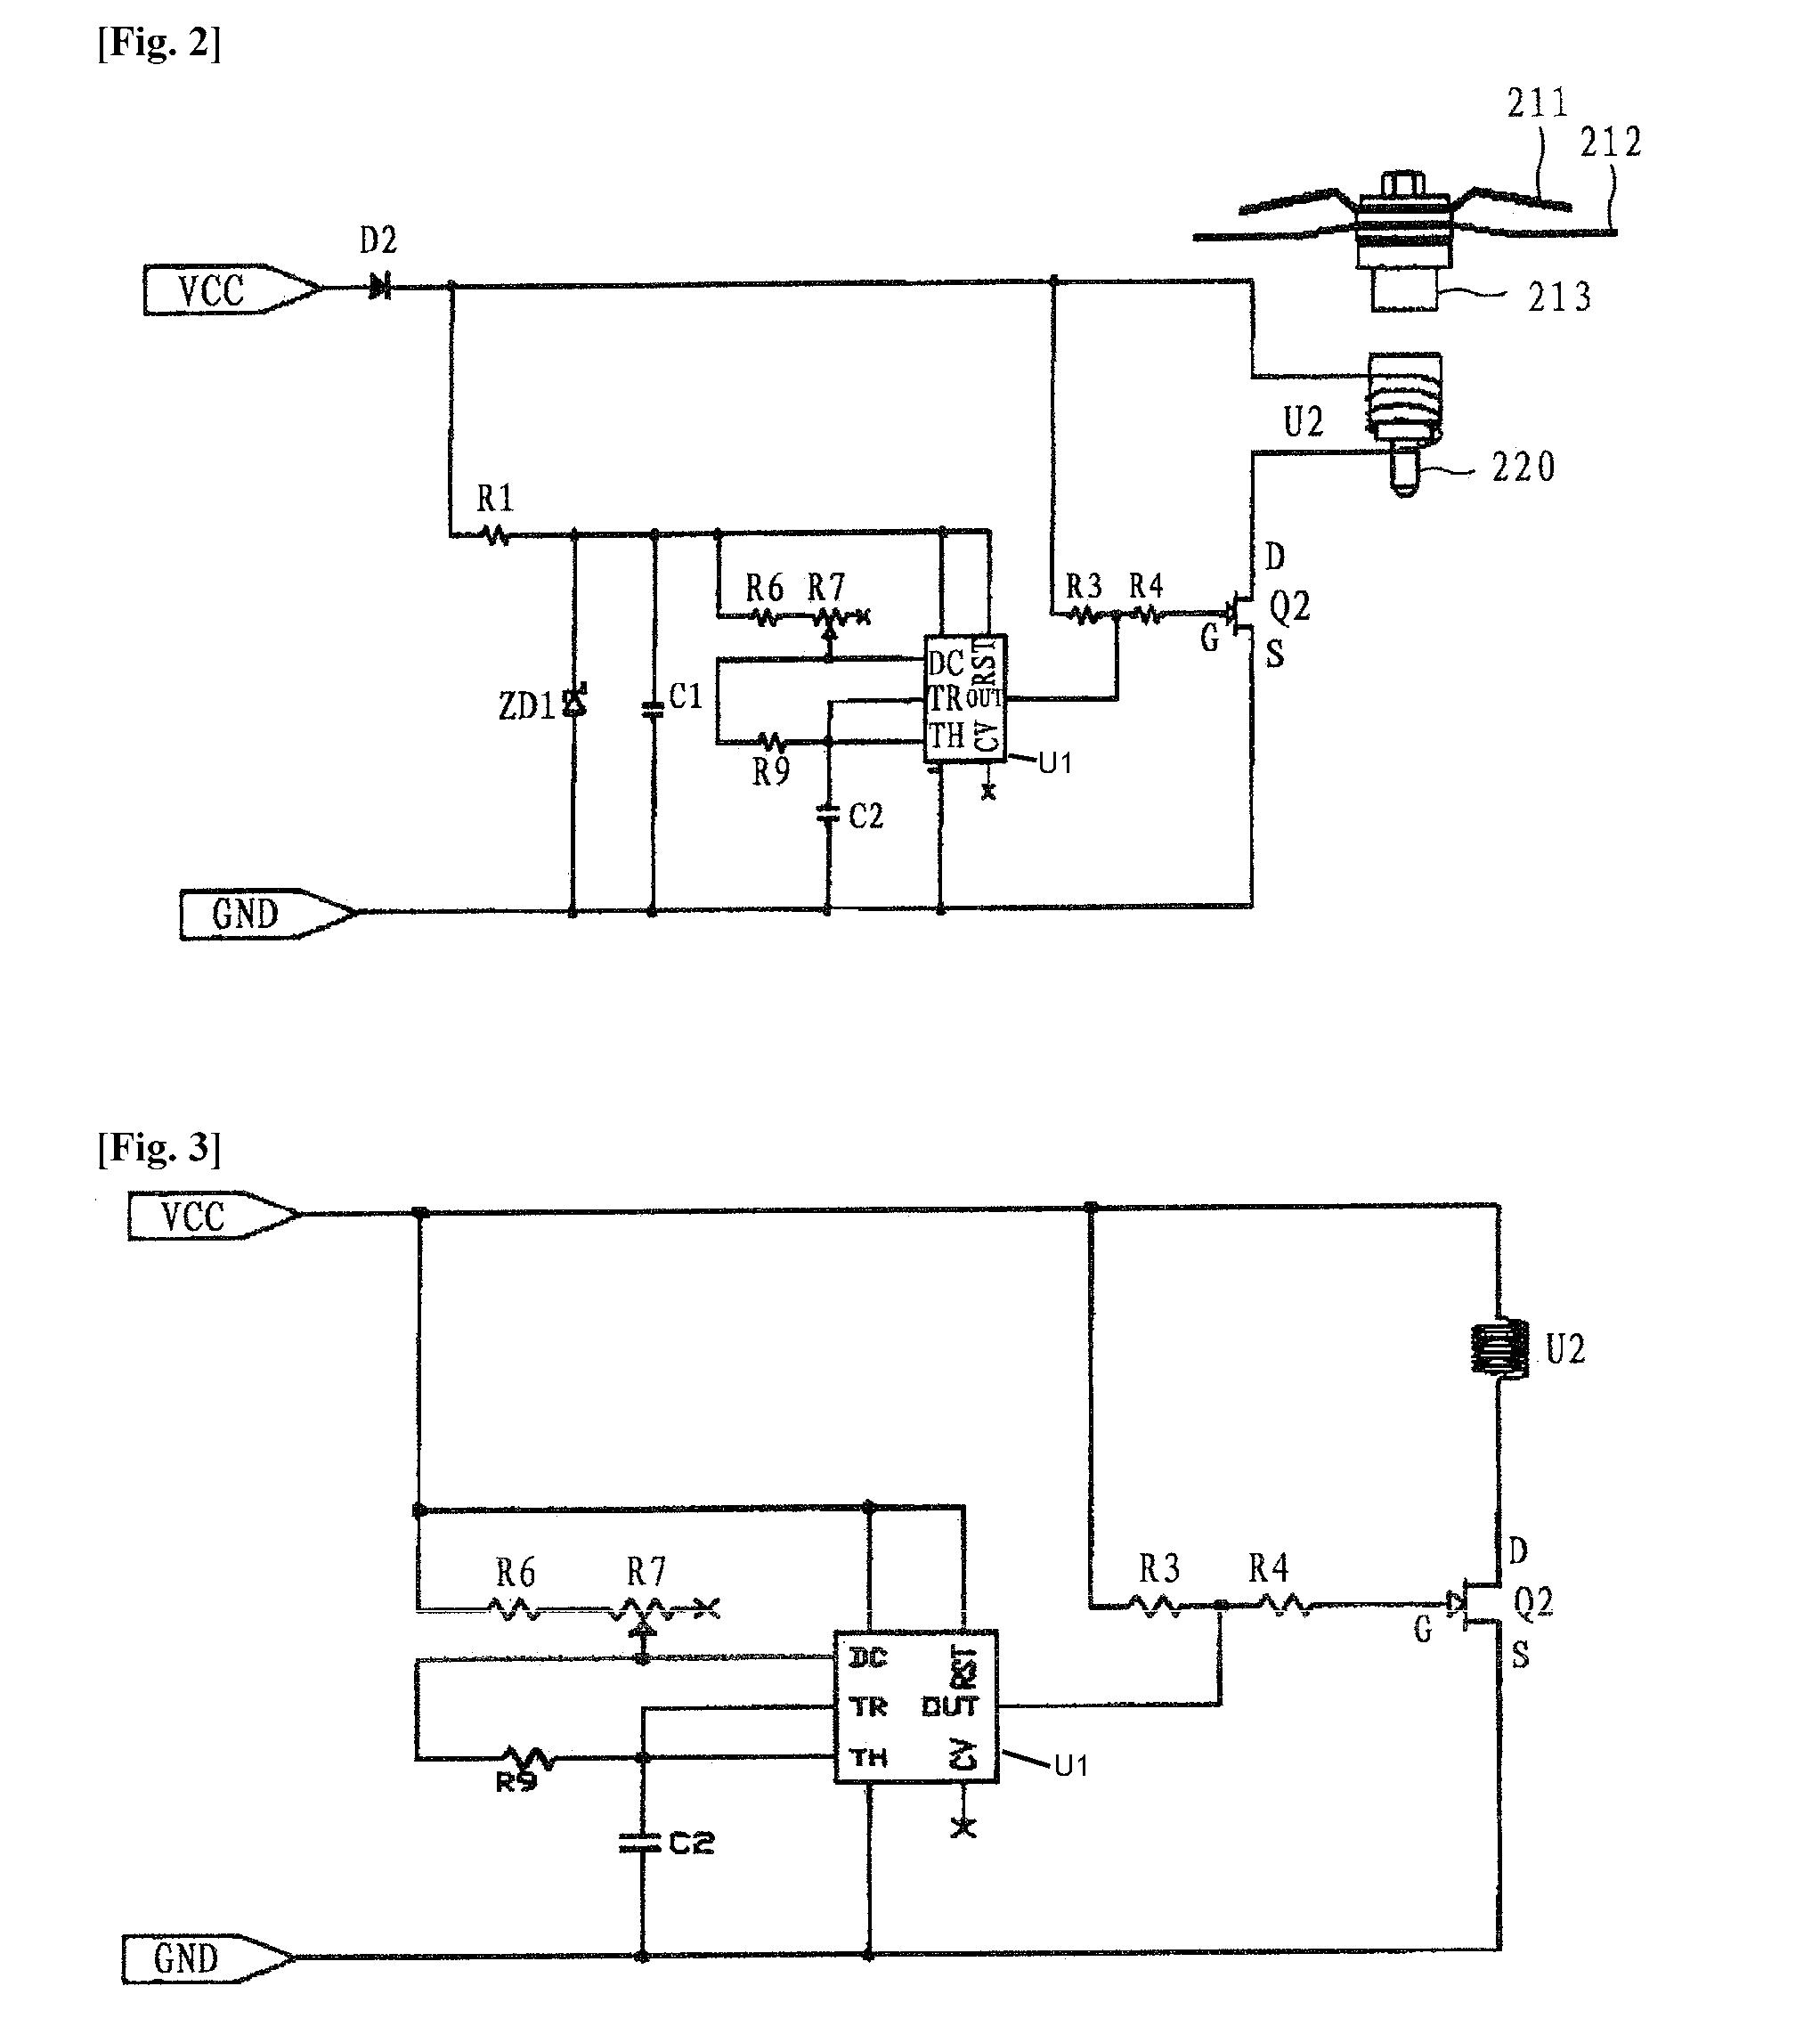 model a horn wiring diagram 2003 dodge ram infinity sound system sparton sa restoration diagrams